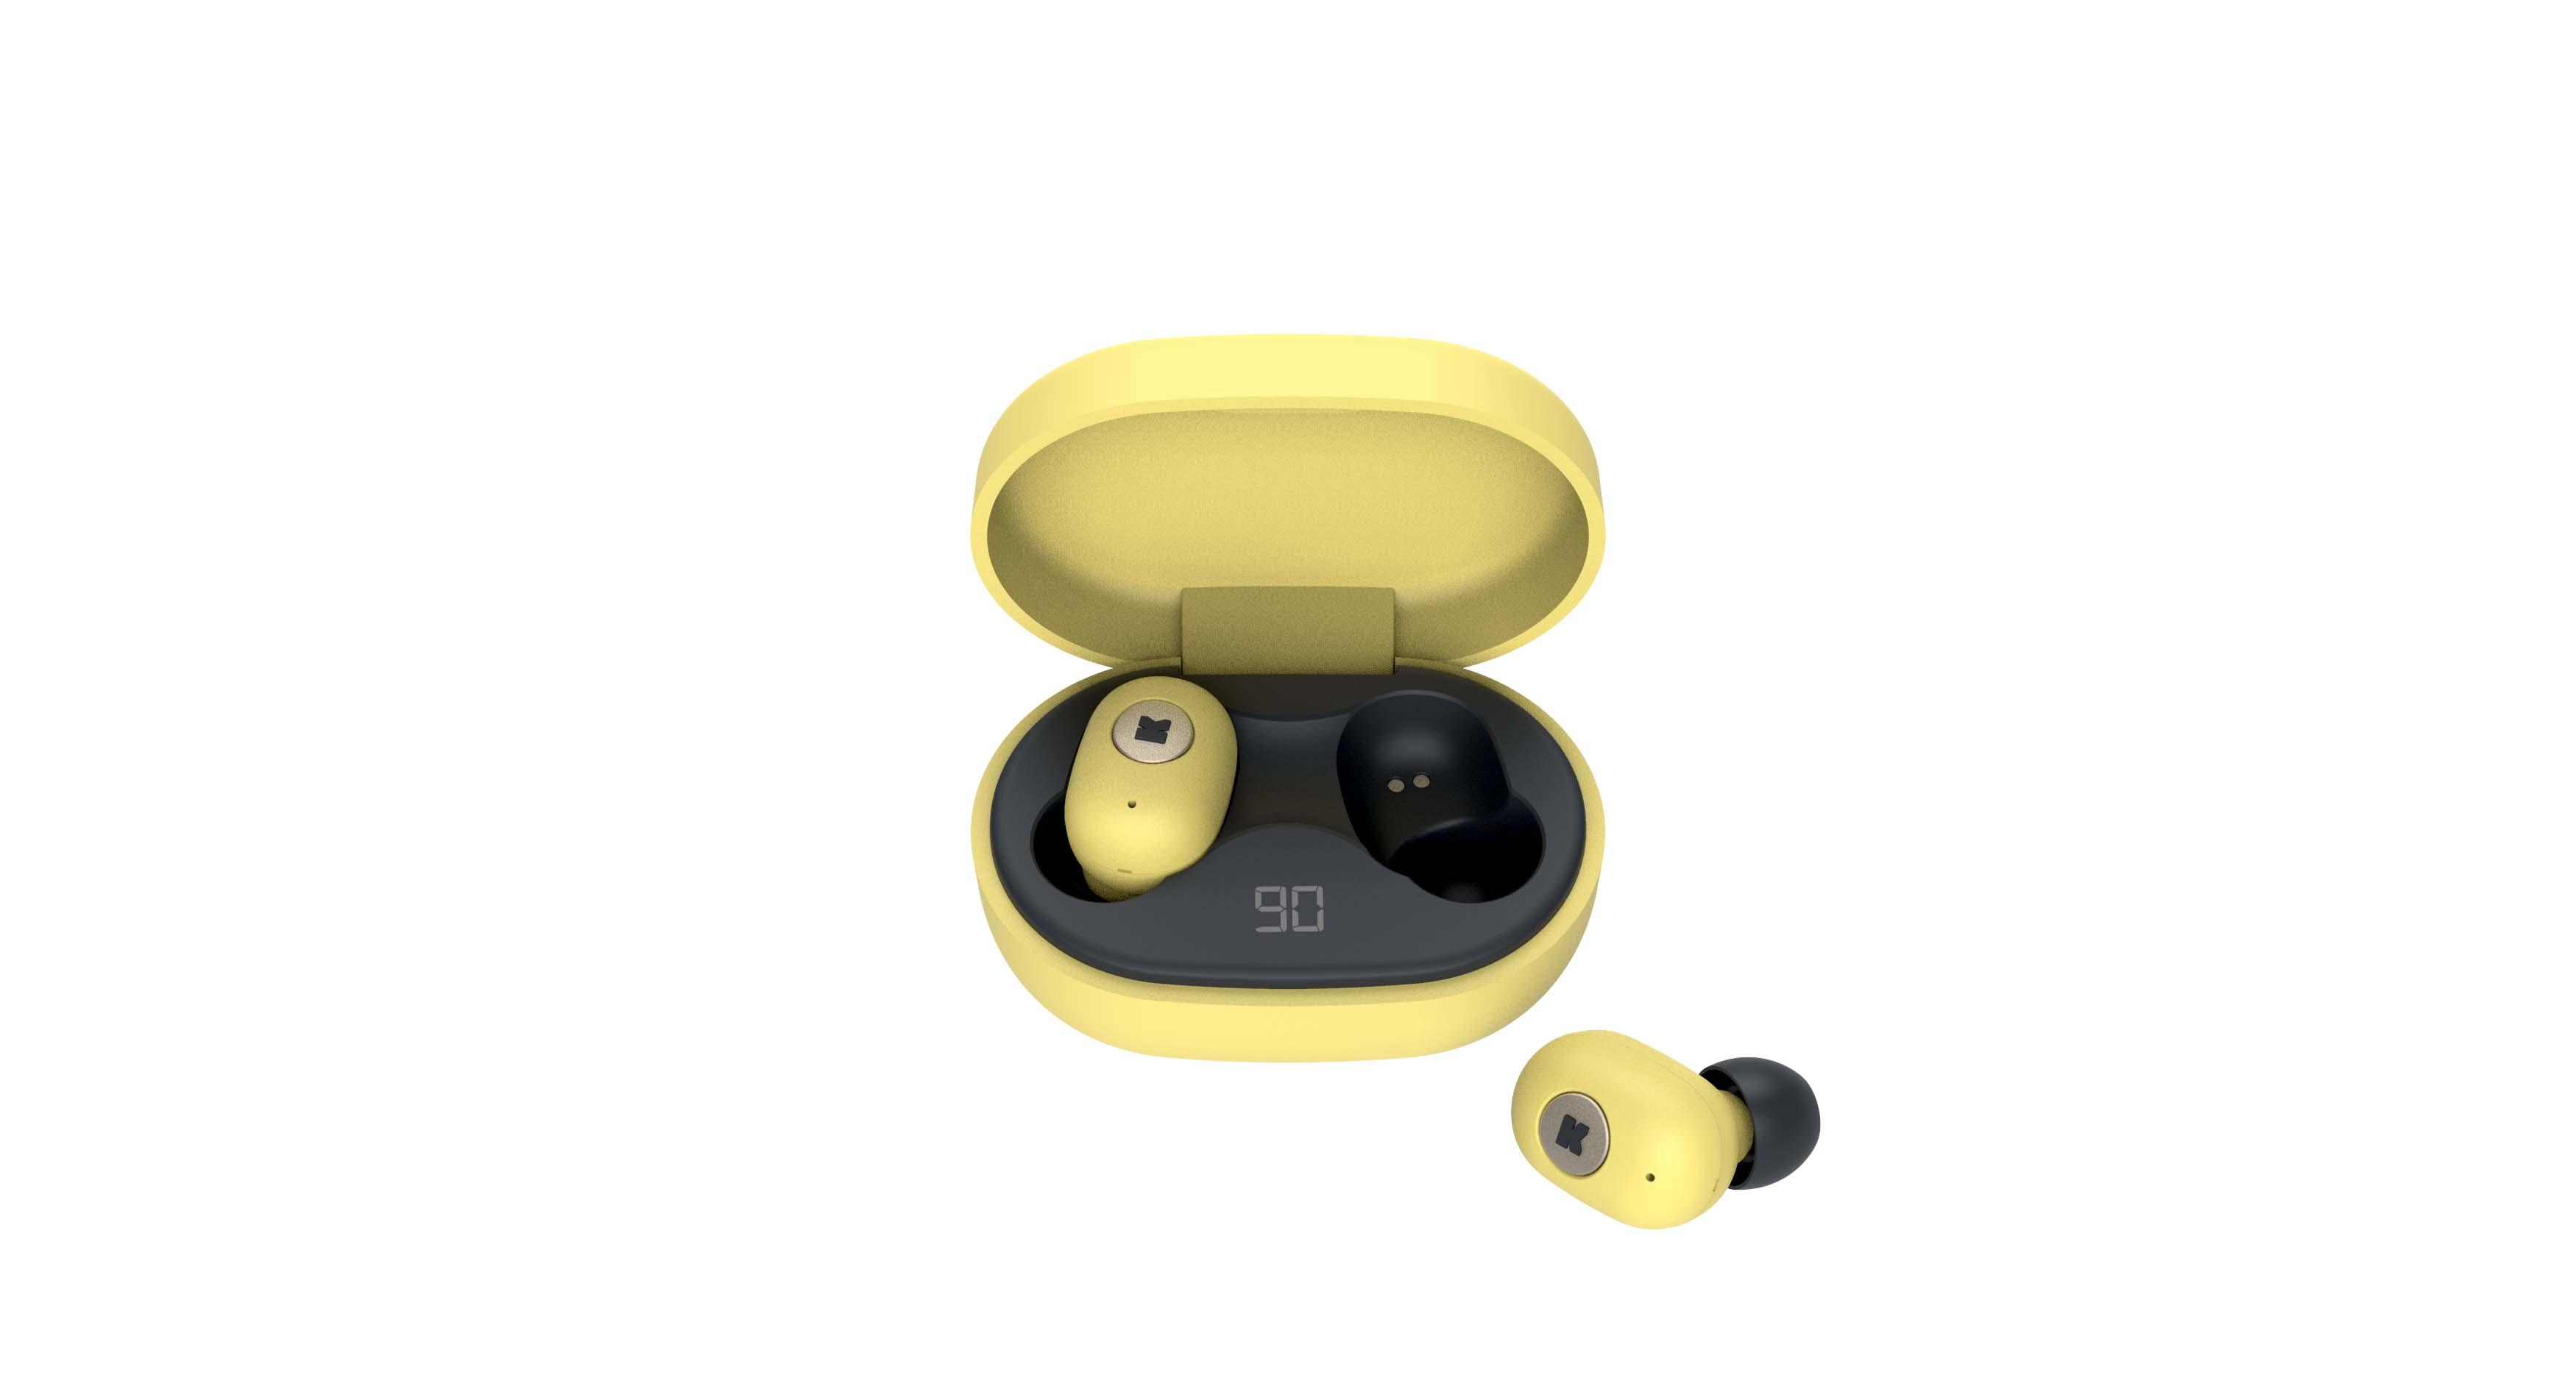 Écouteurs bluetooth TWS jaune